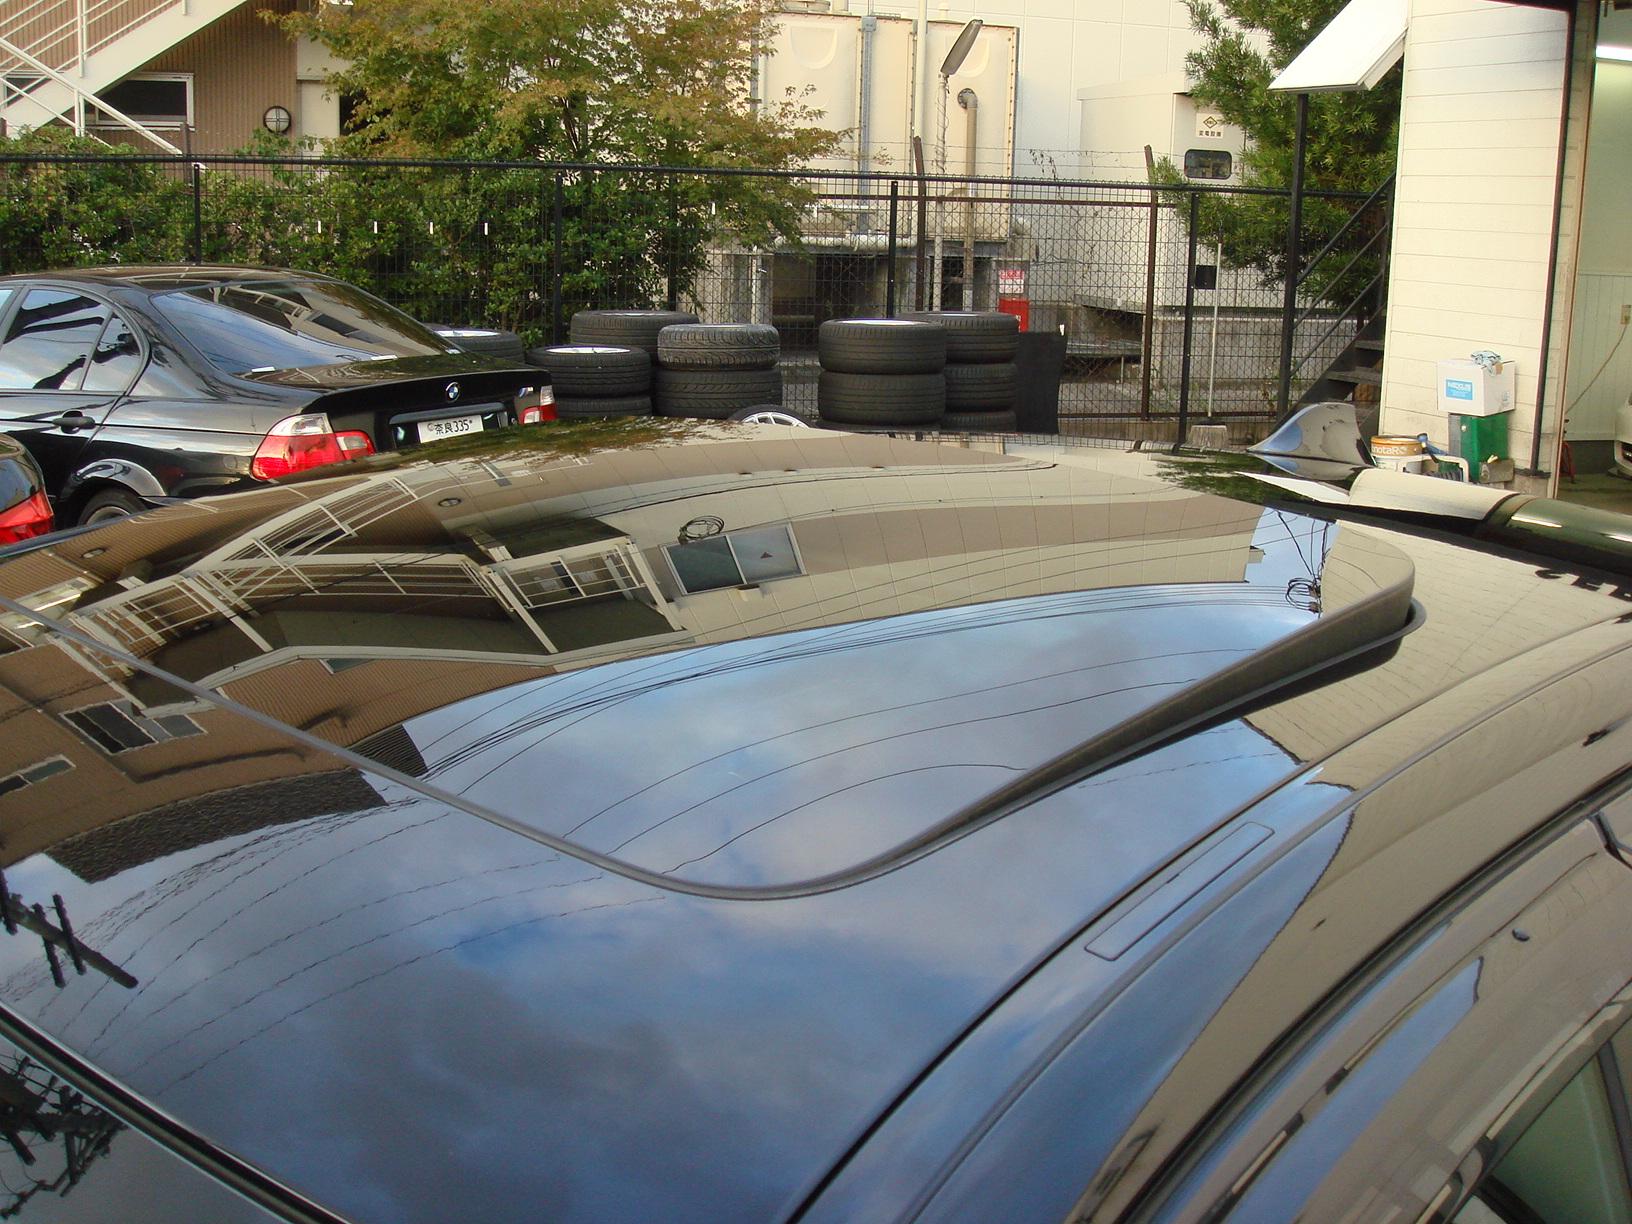 BMW 523iBEAMコンプリートカー ワンオーナー サンルーフ ブラックレザー車両画像15